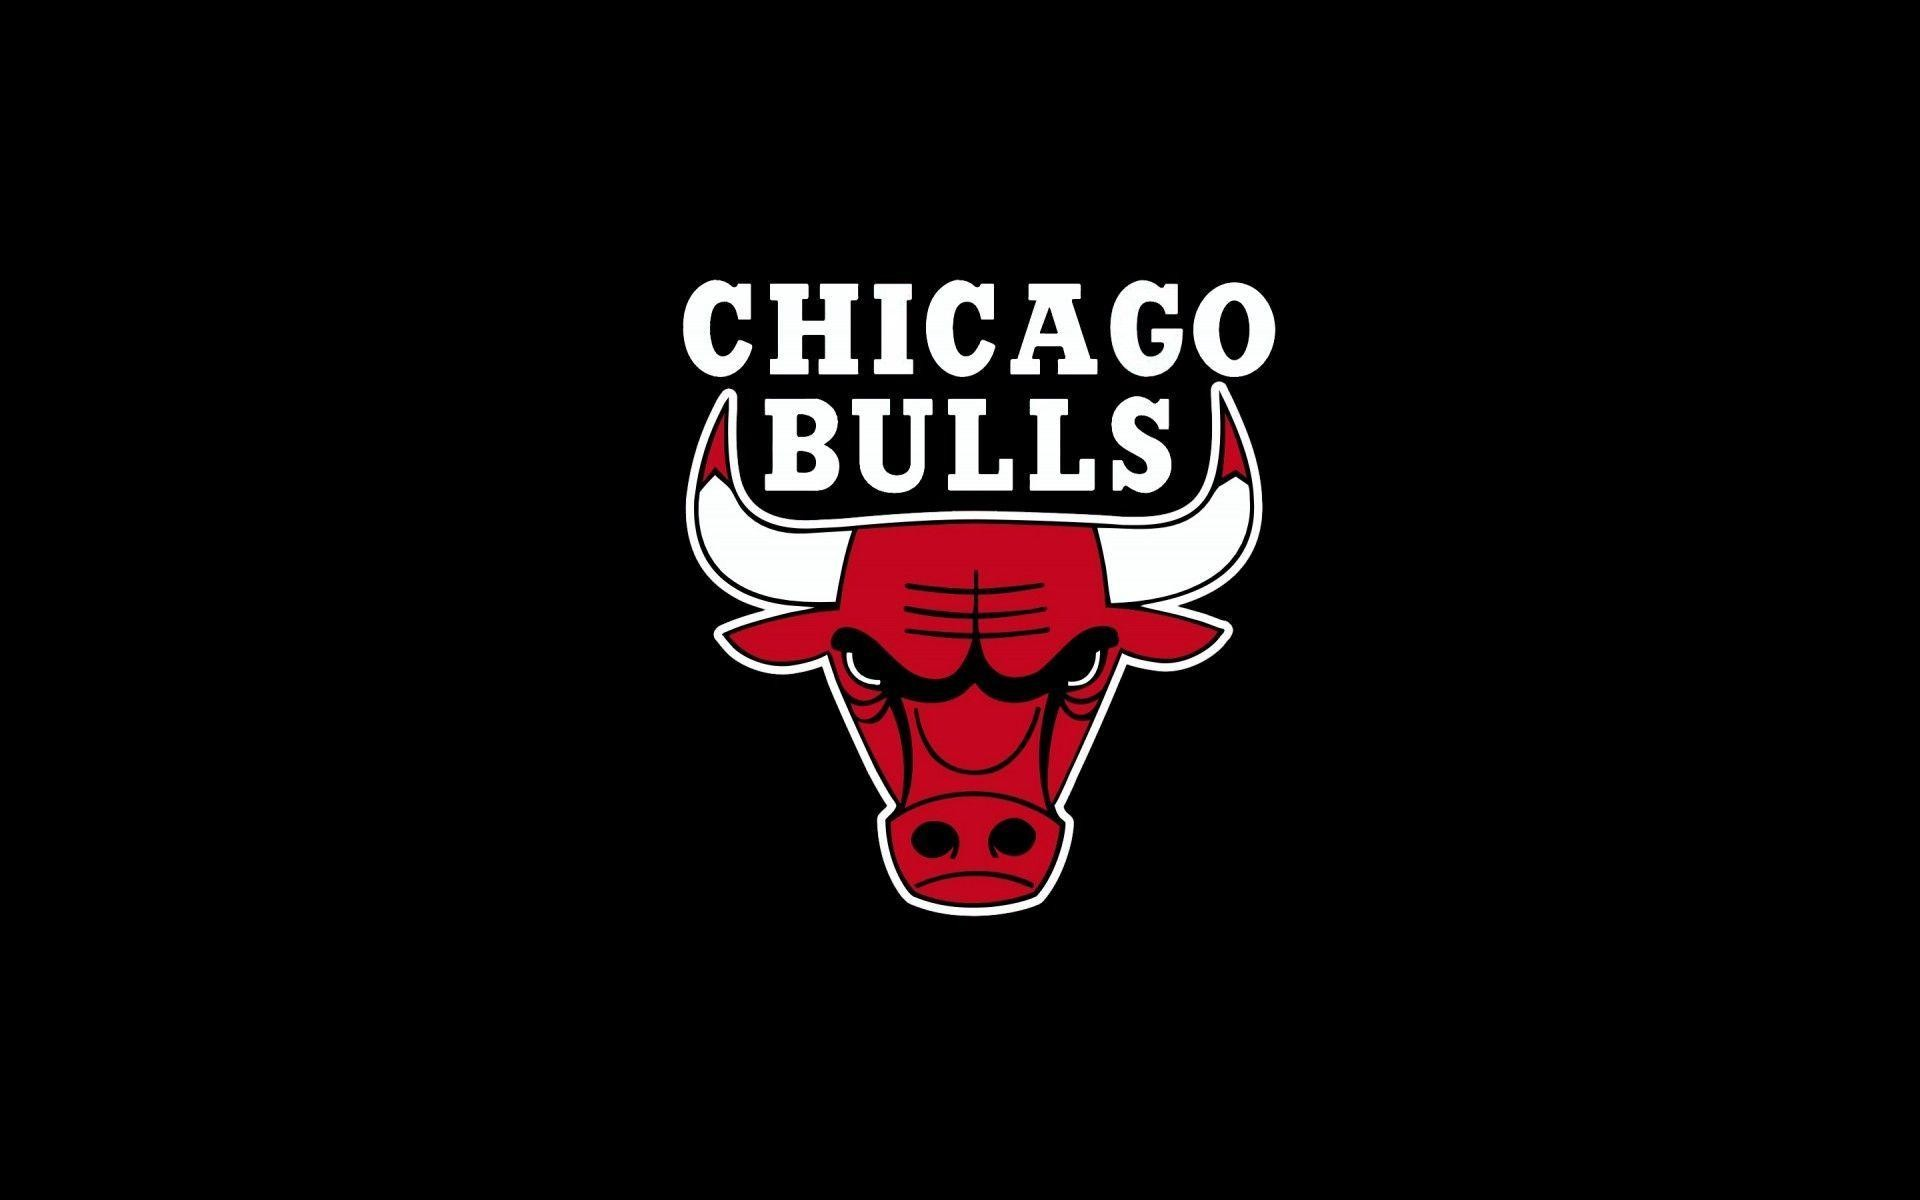 1920x1200 Chicago Bulls Wallpapers